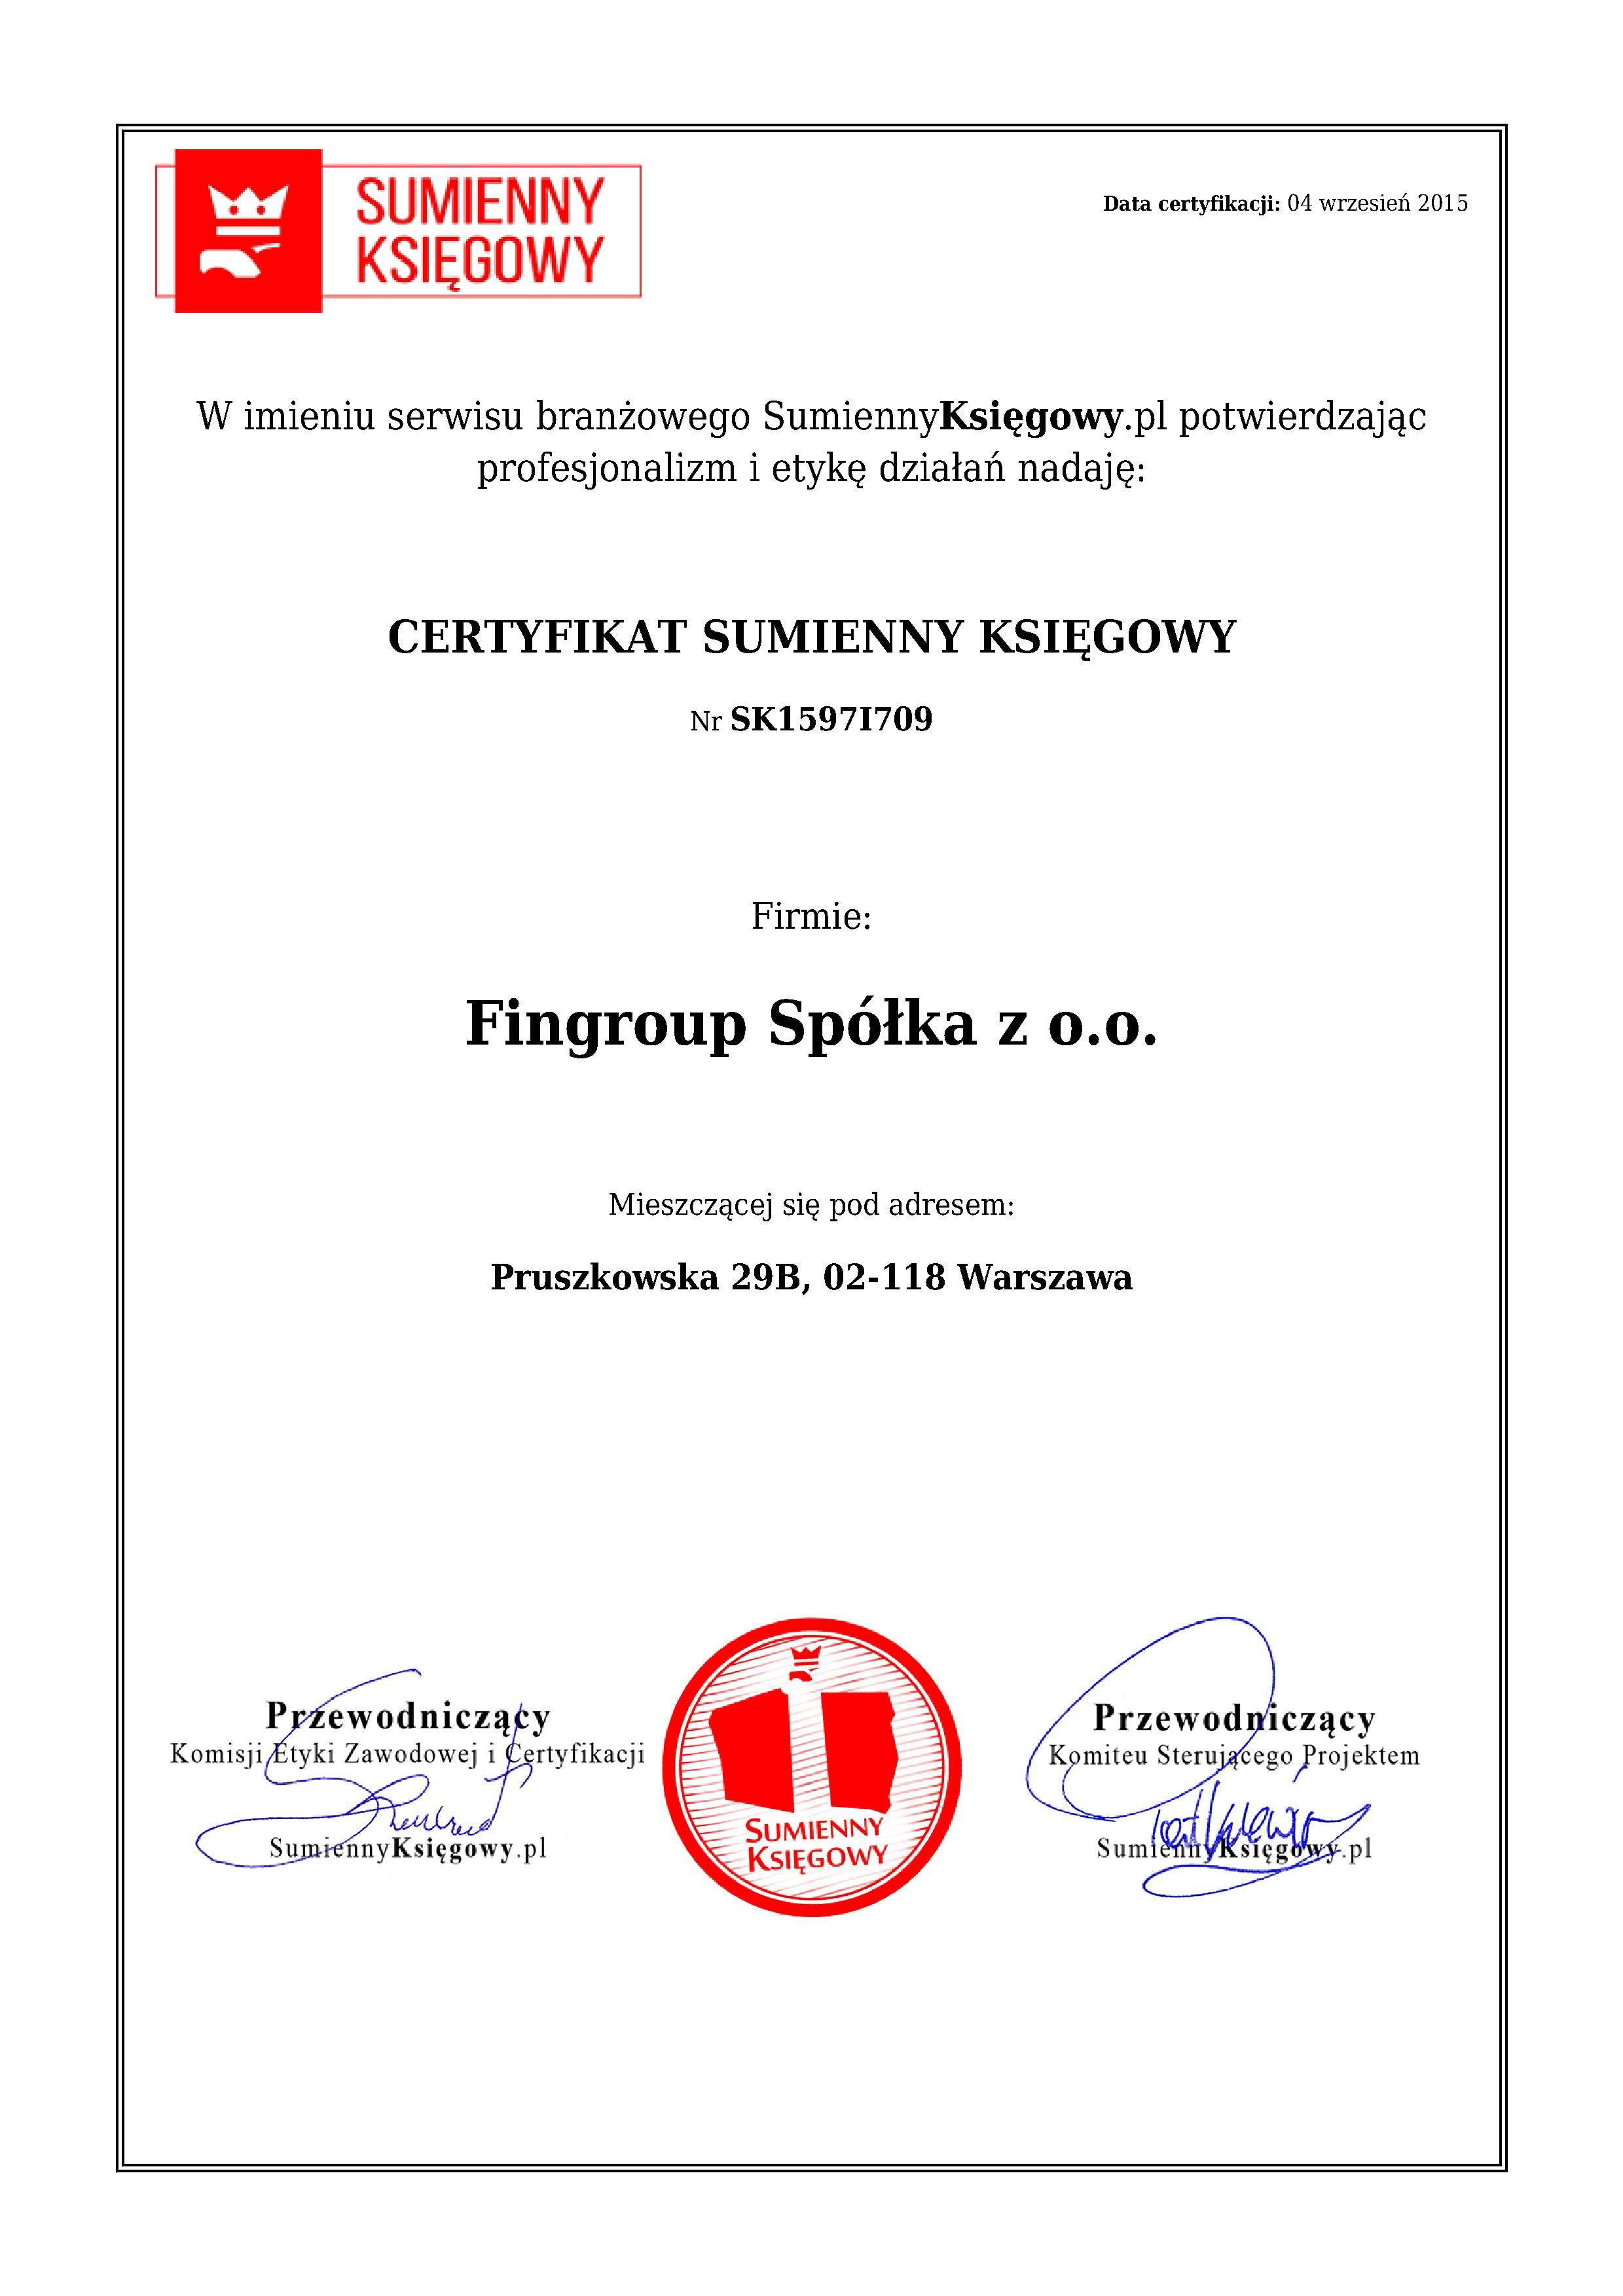 Certyfikat Fingroup Spółka z o.o.